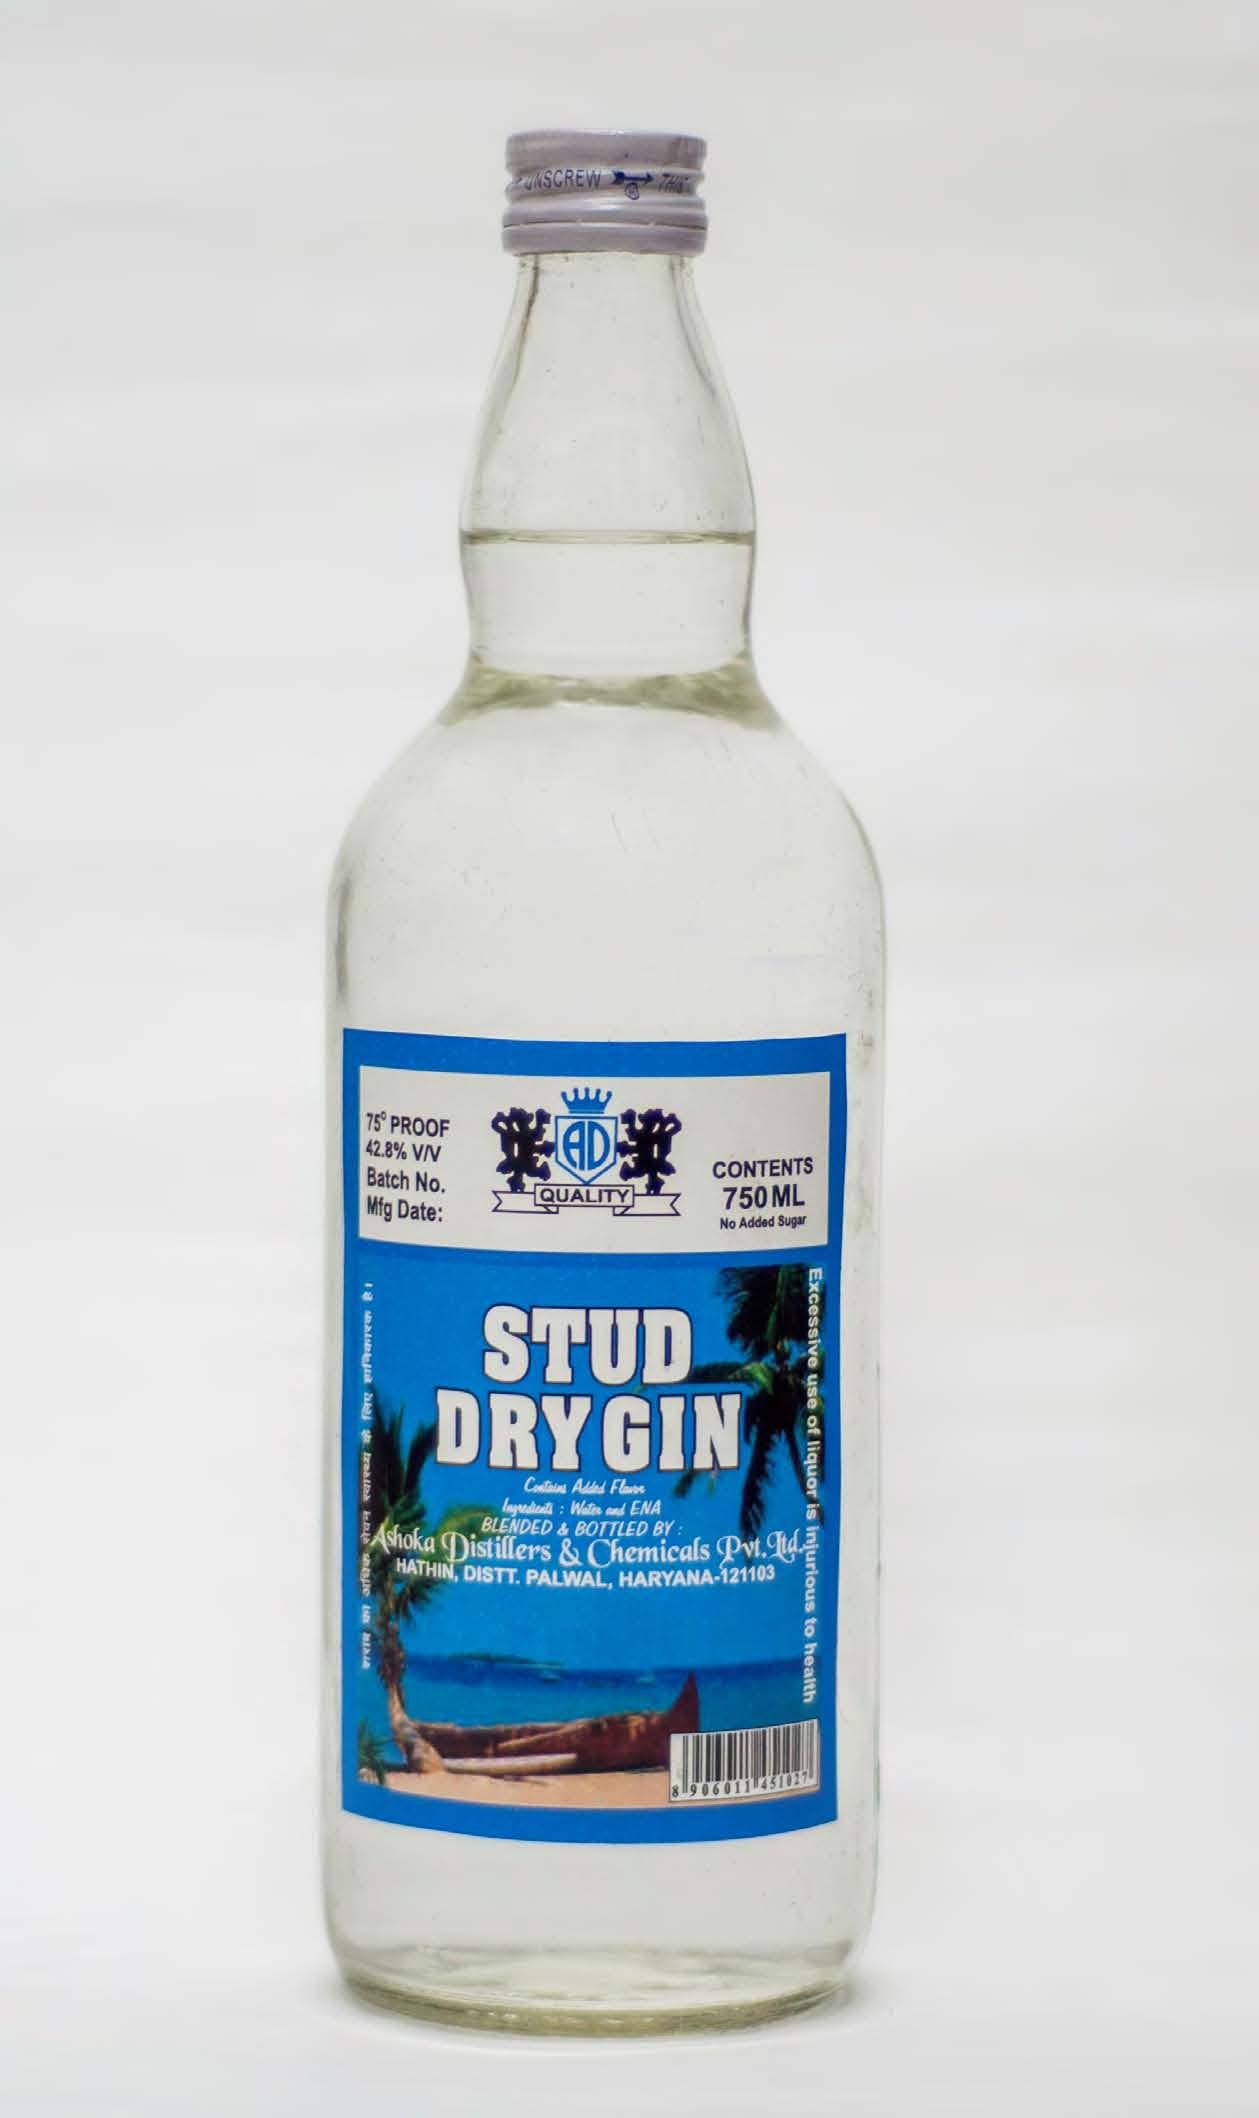 Stud Dry Gin.